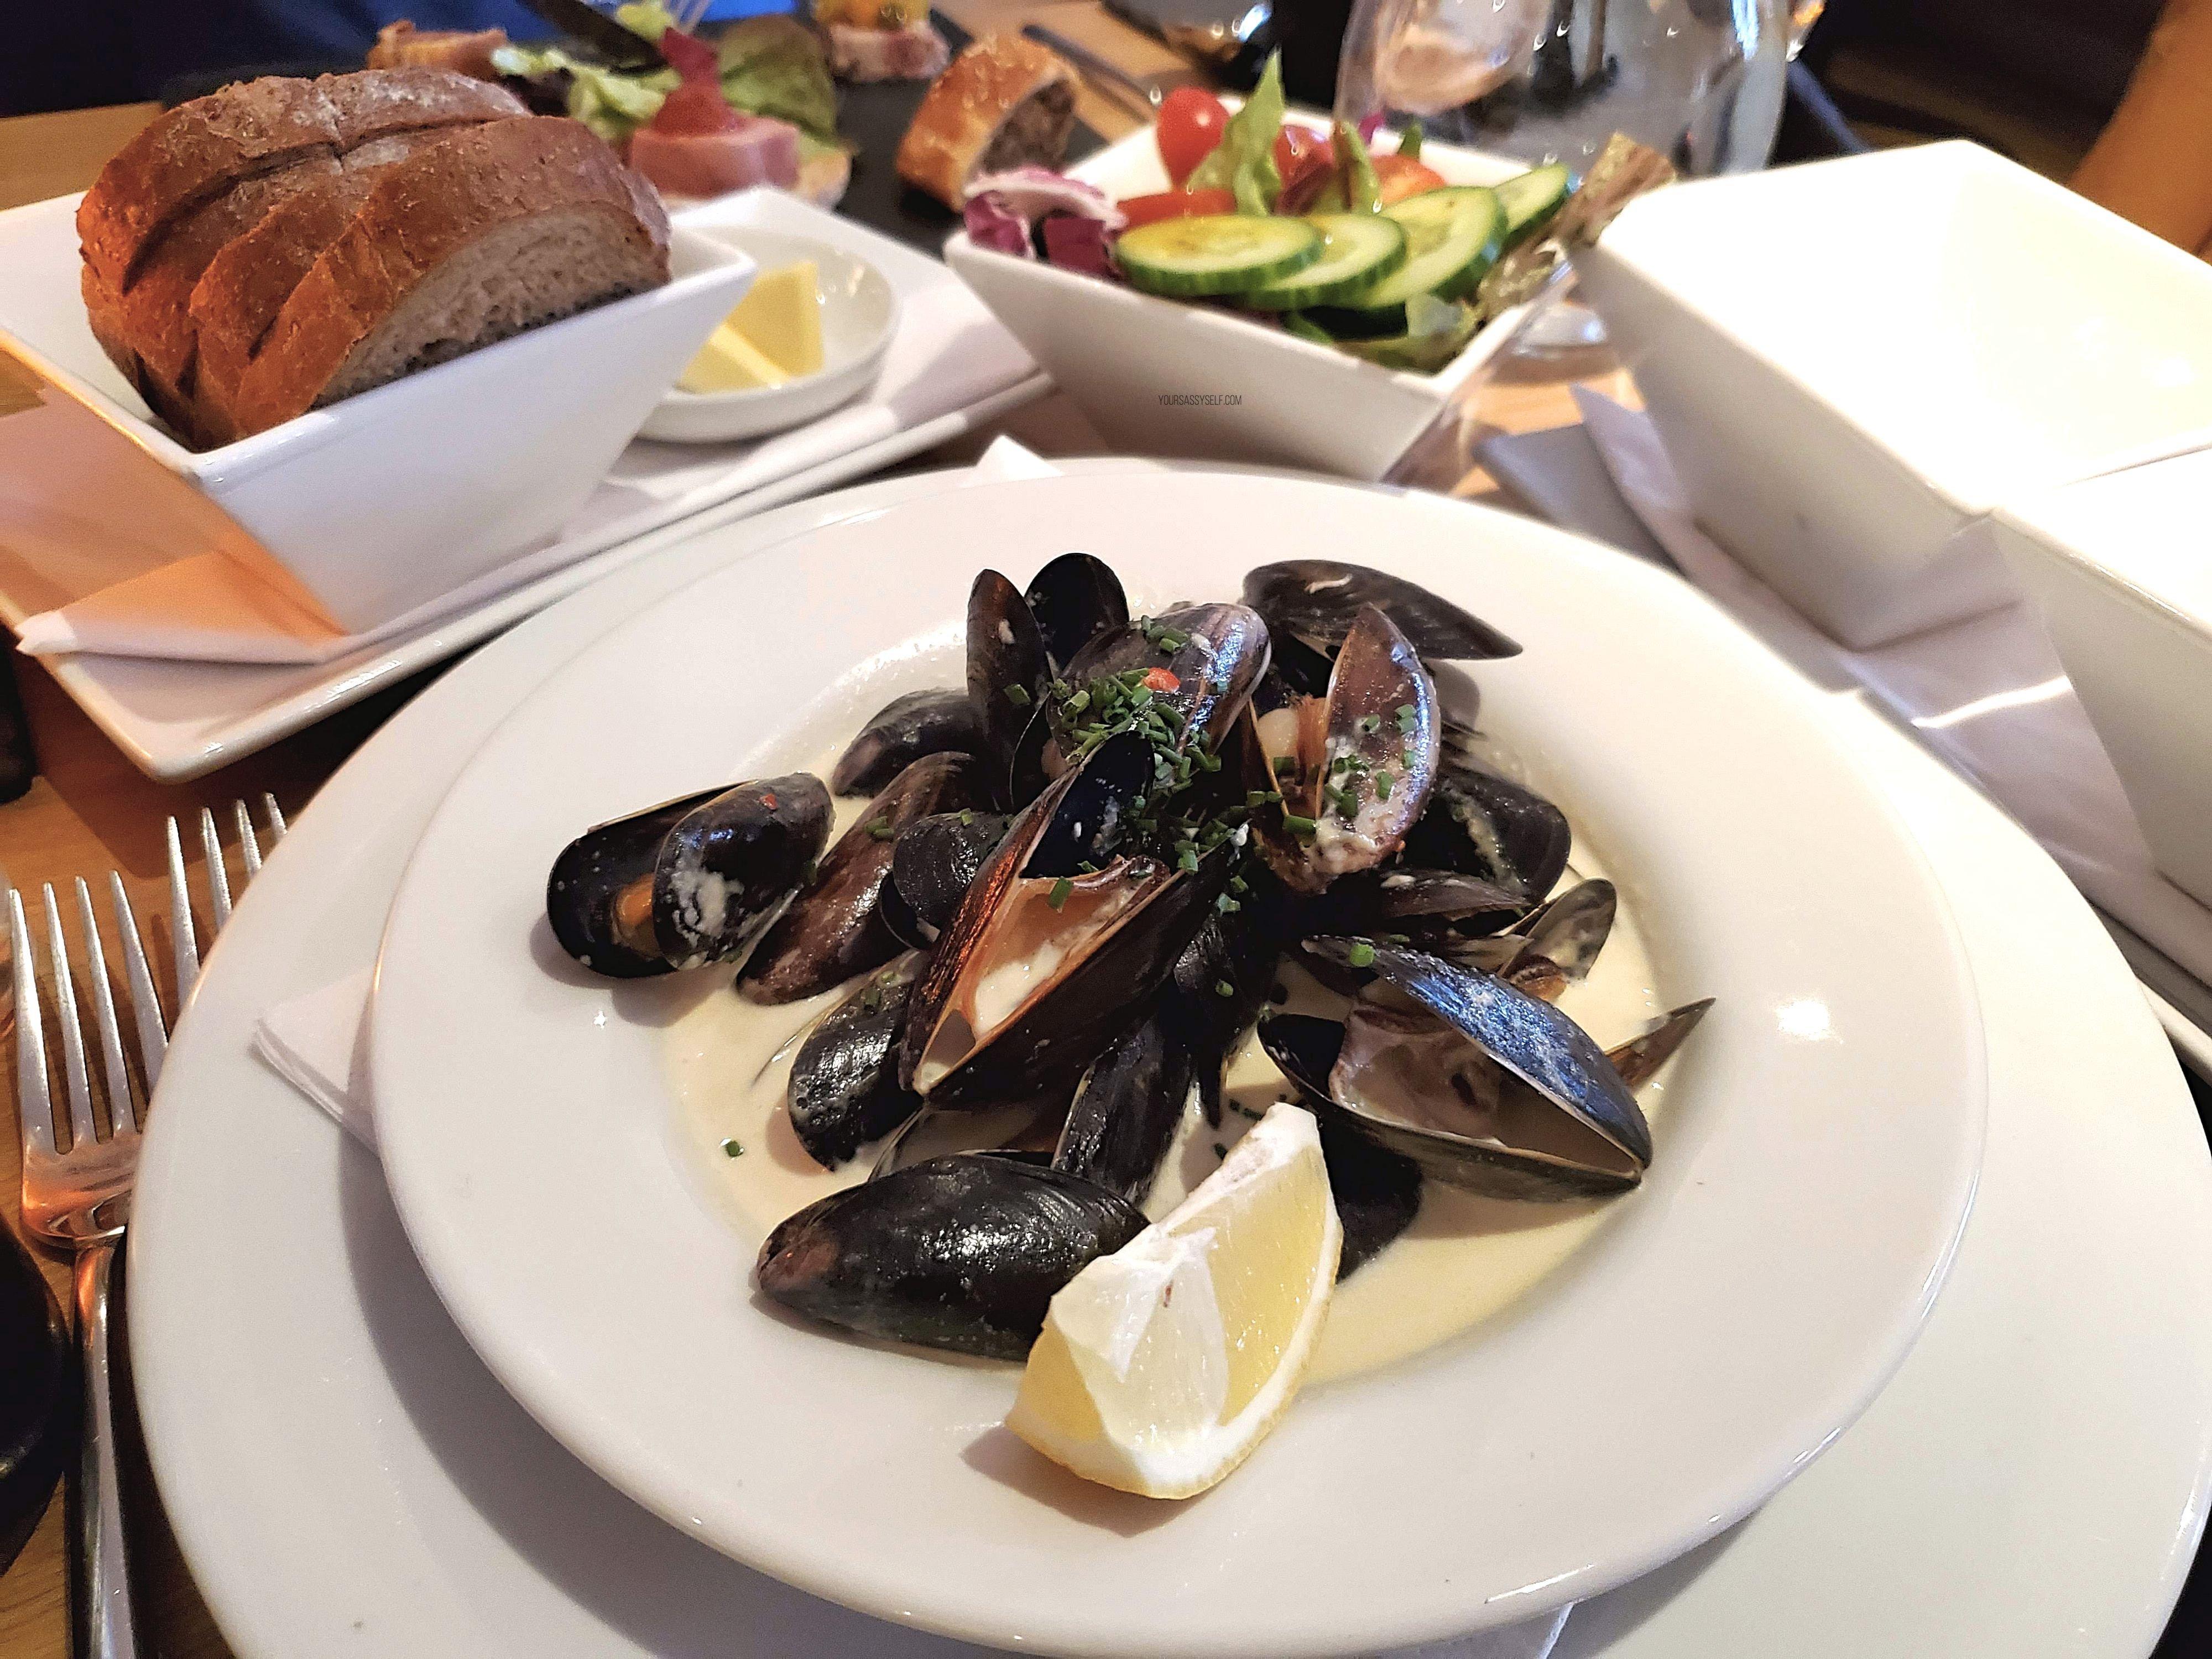 Mussels bread and salad - yoursassyself.com